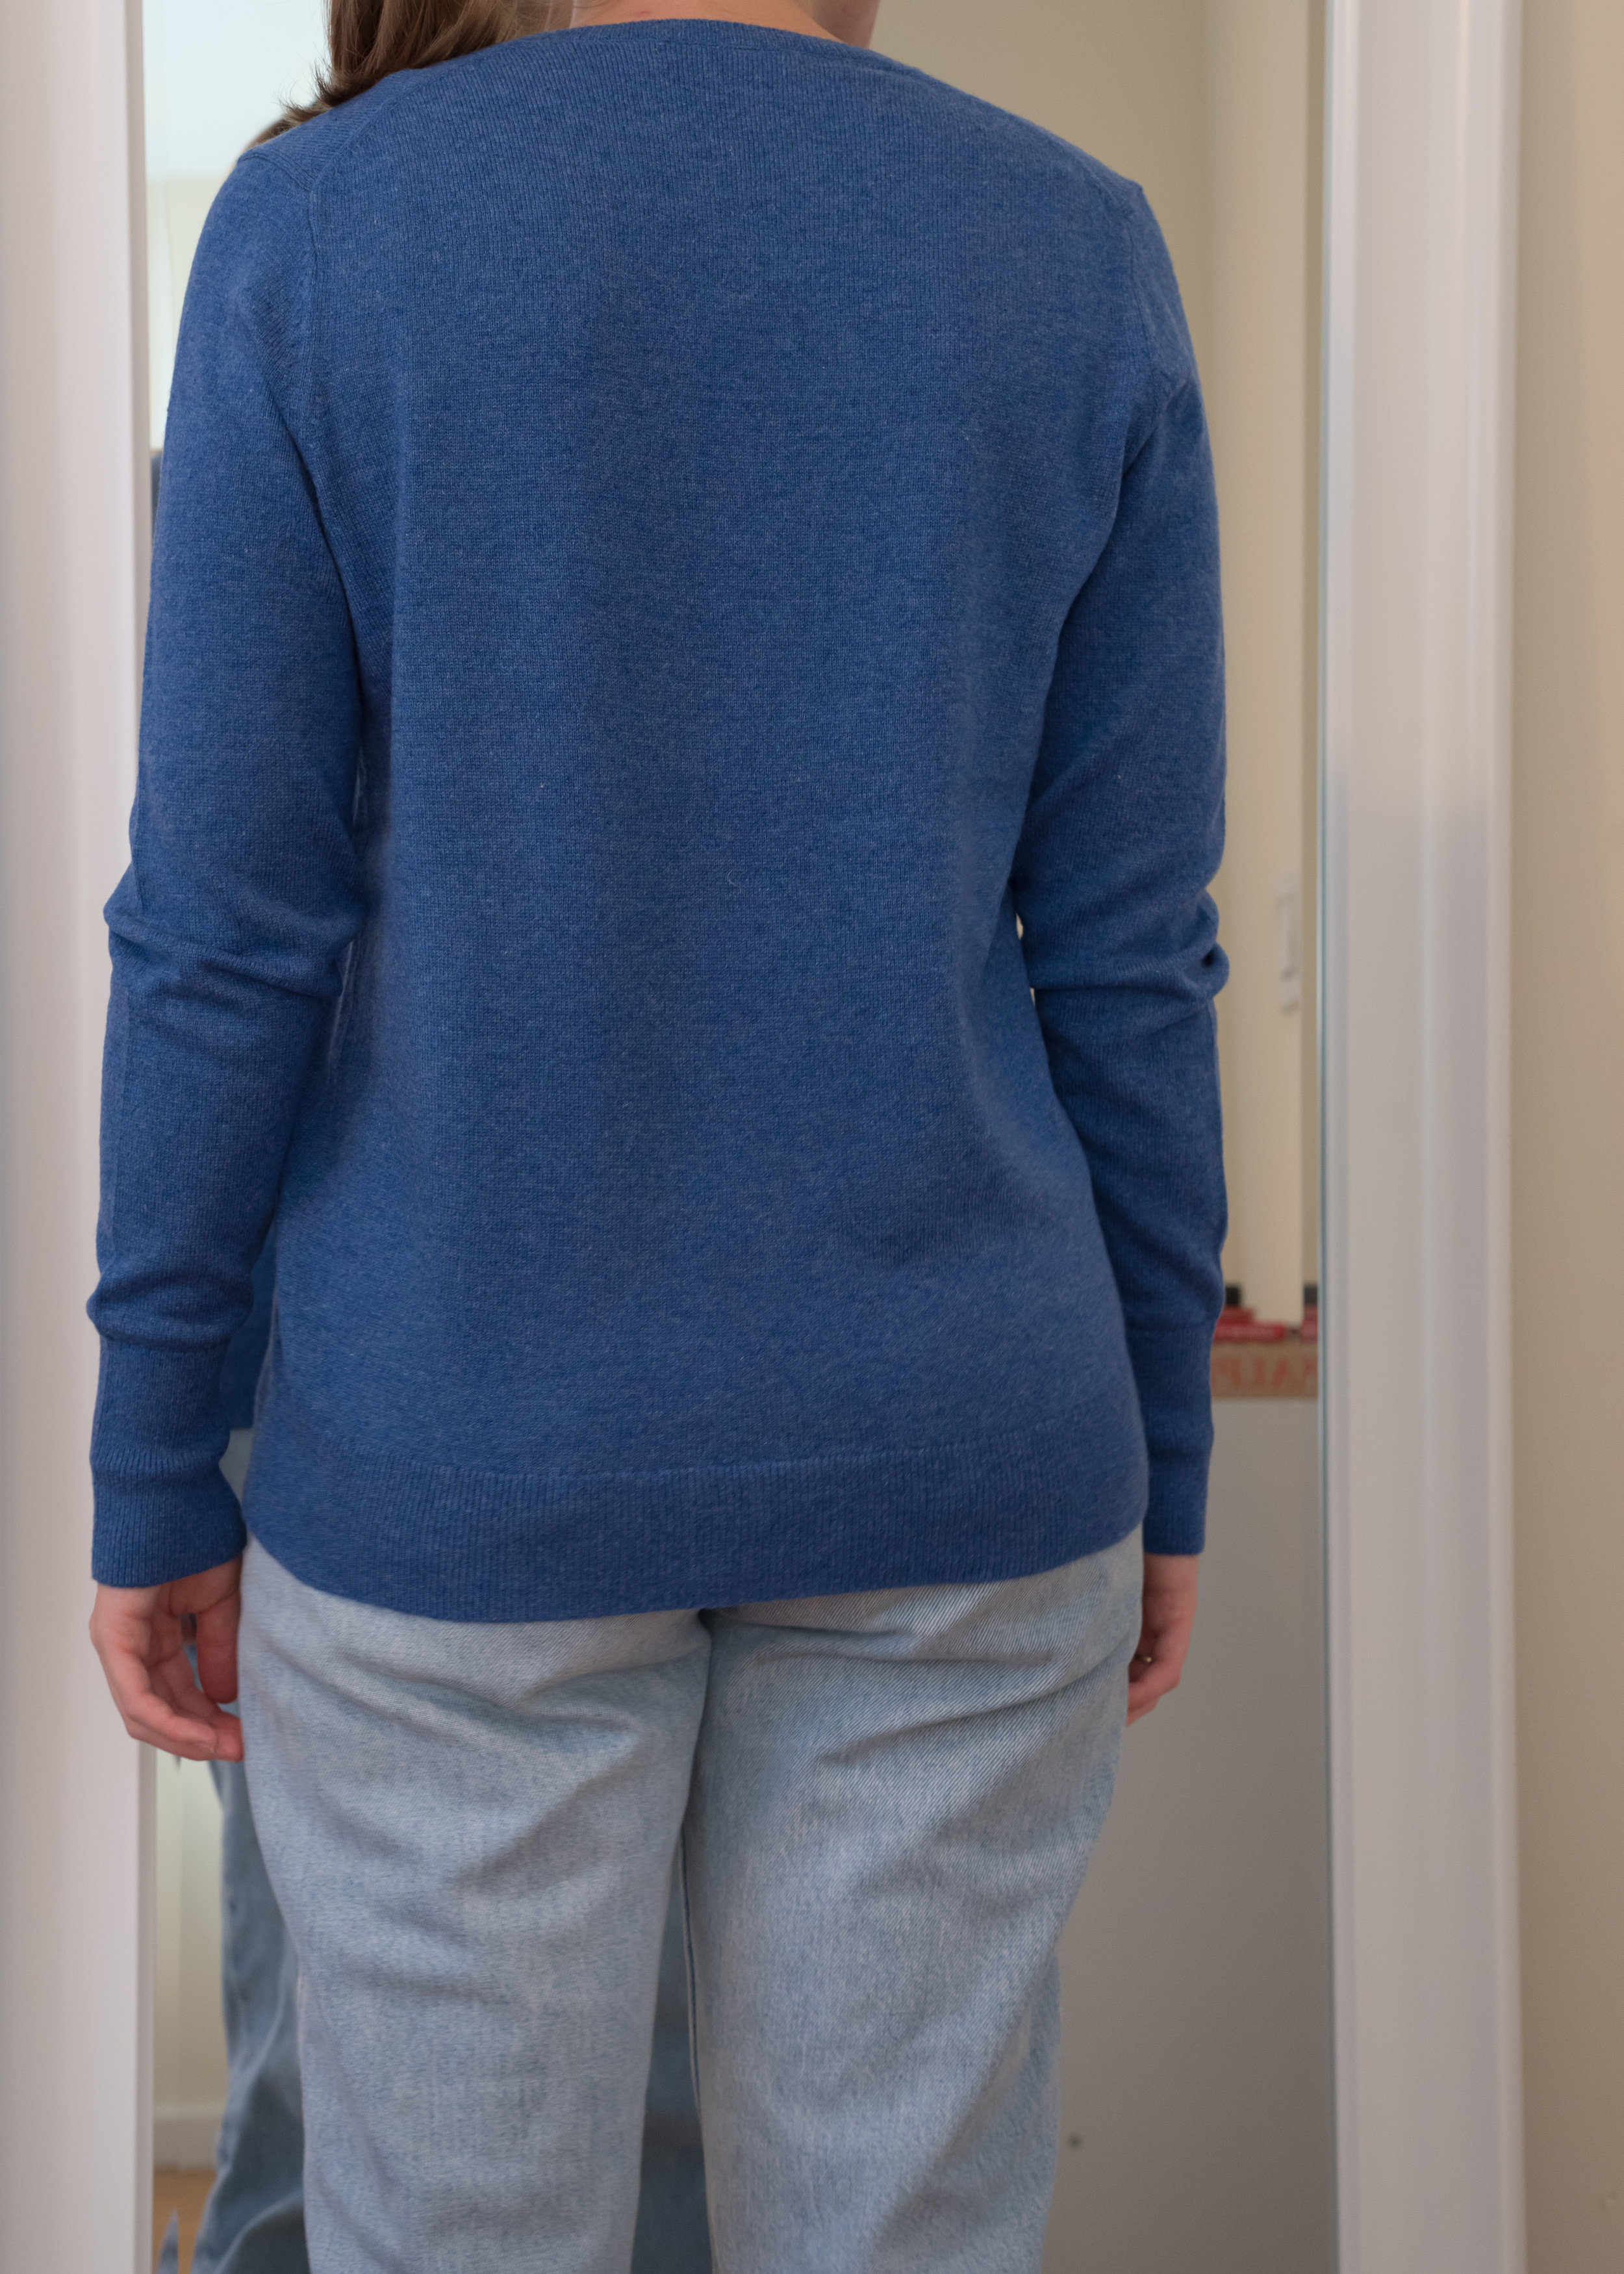 Everlane Cashmere V-Neck Sweater - Back View